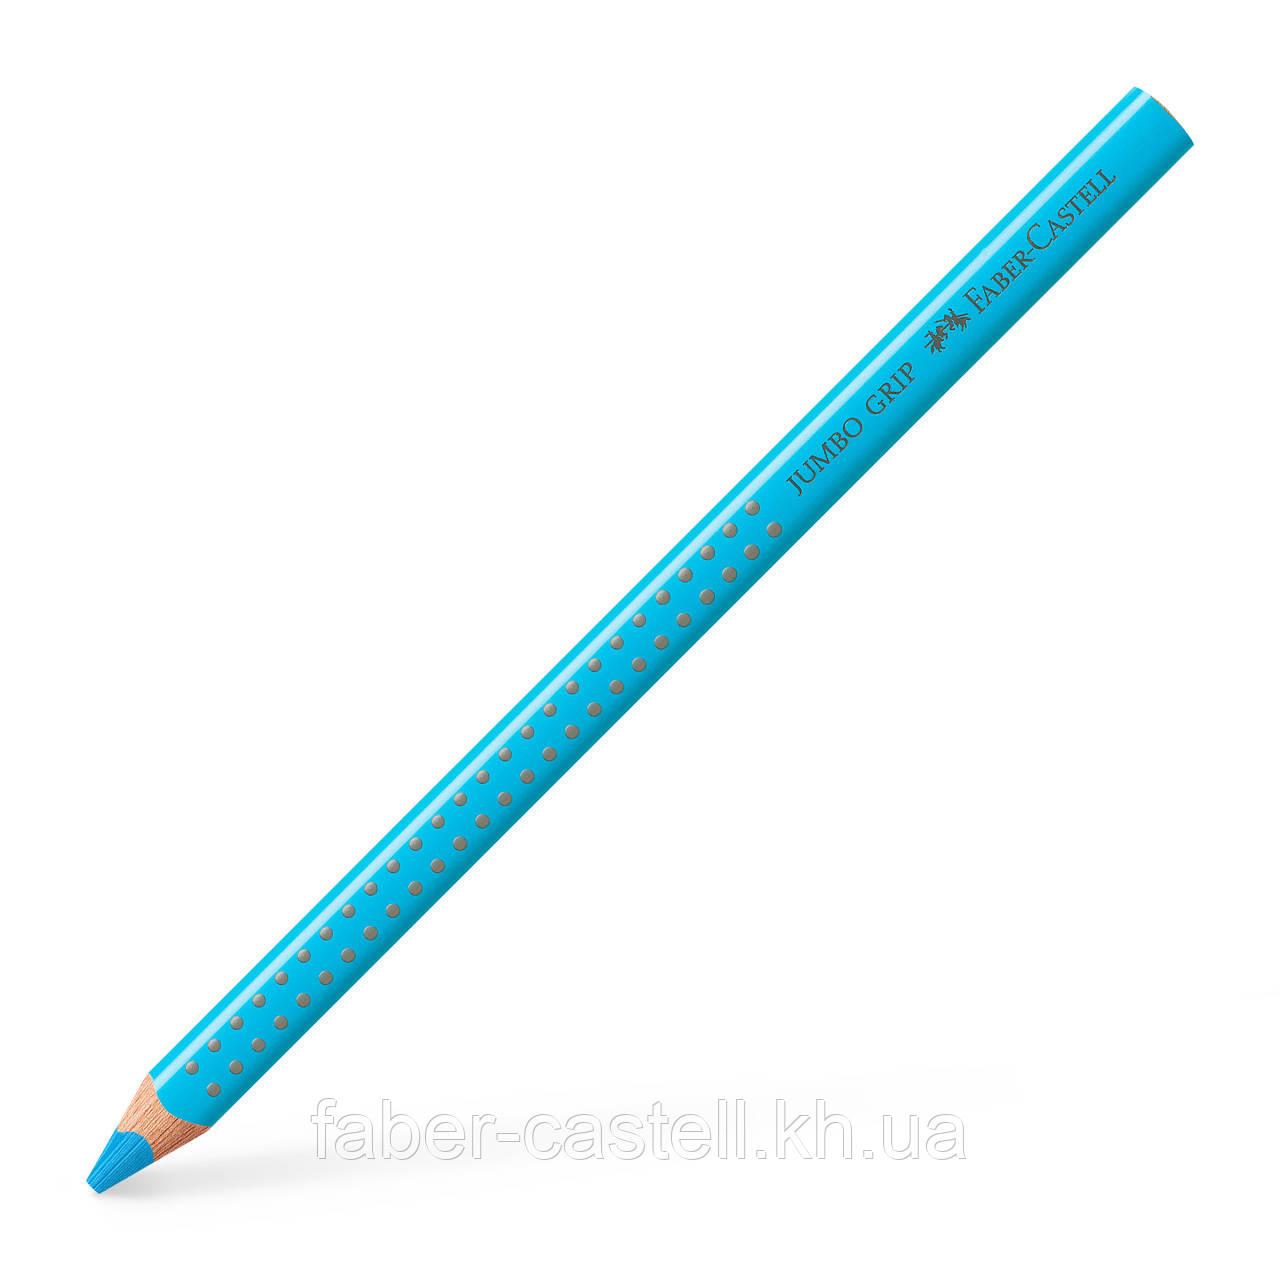 Утолщенный цветной карандаш Faber-Castell Jumbo Grip цвет голубой, 110947